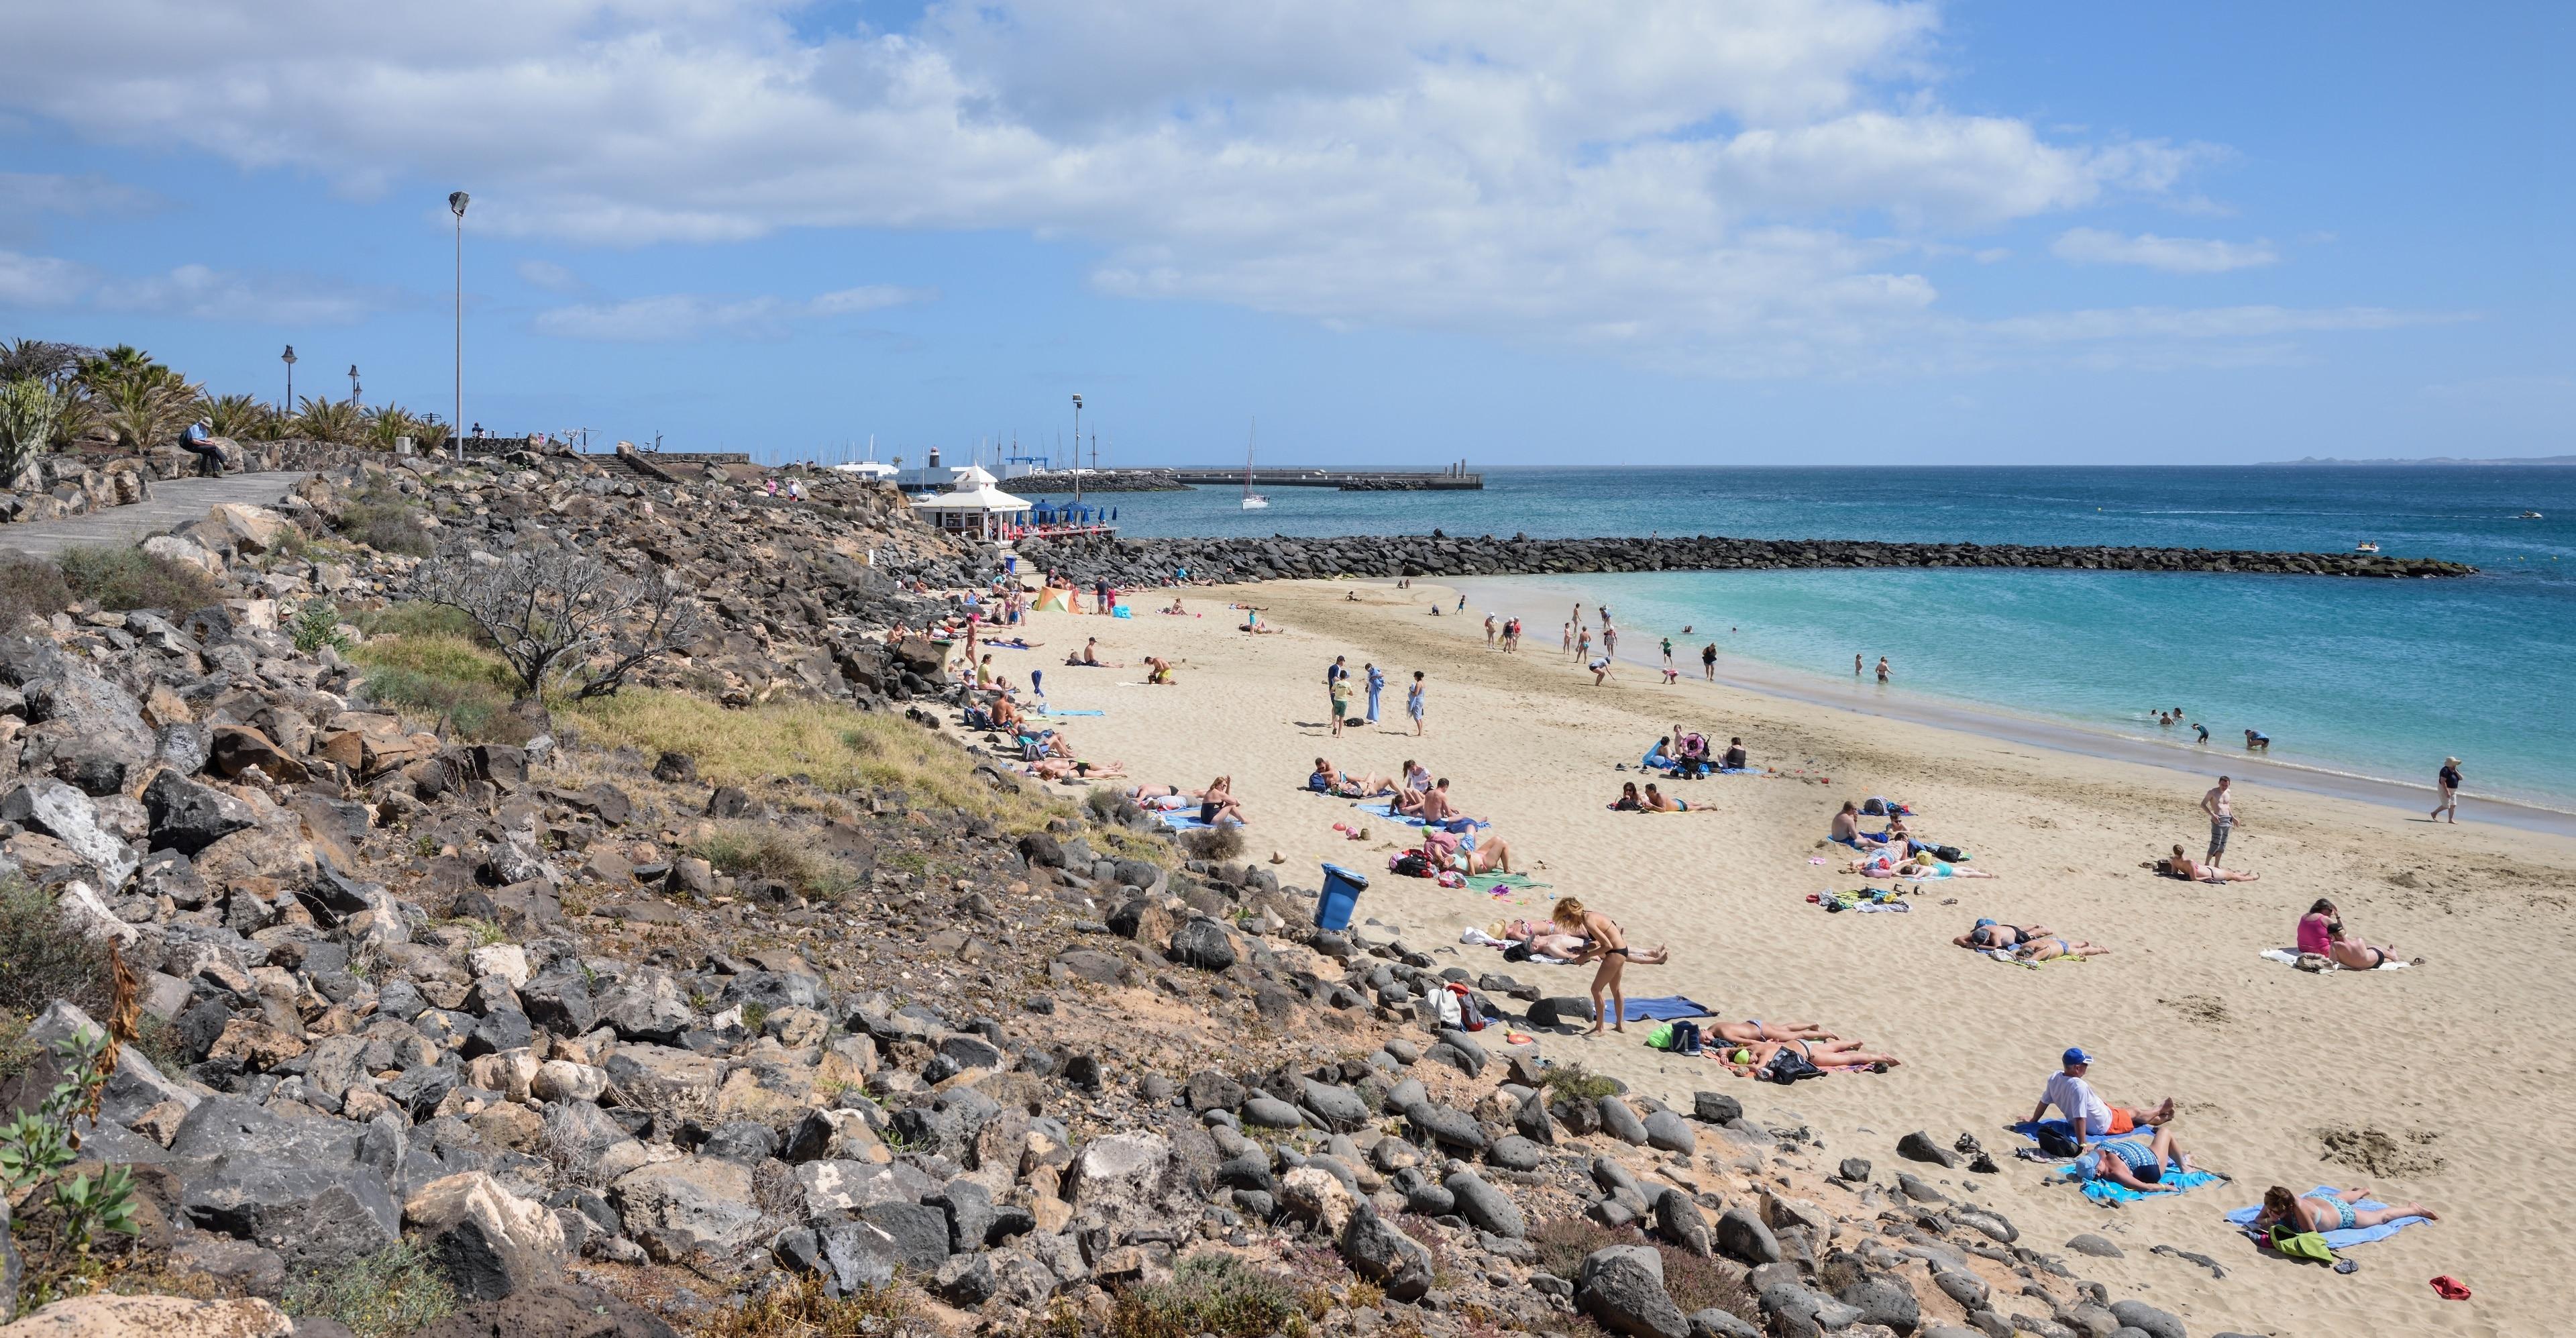 Dorada Beach, Yaiza, Canary Islands, Spain